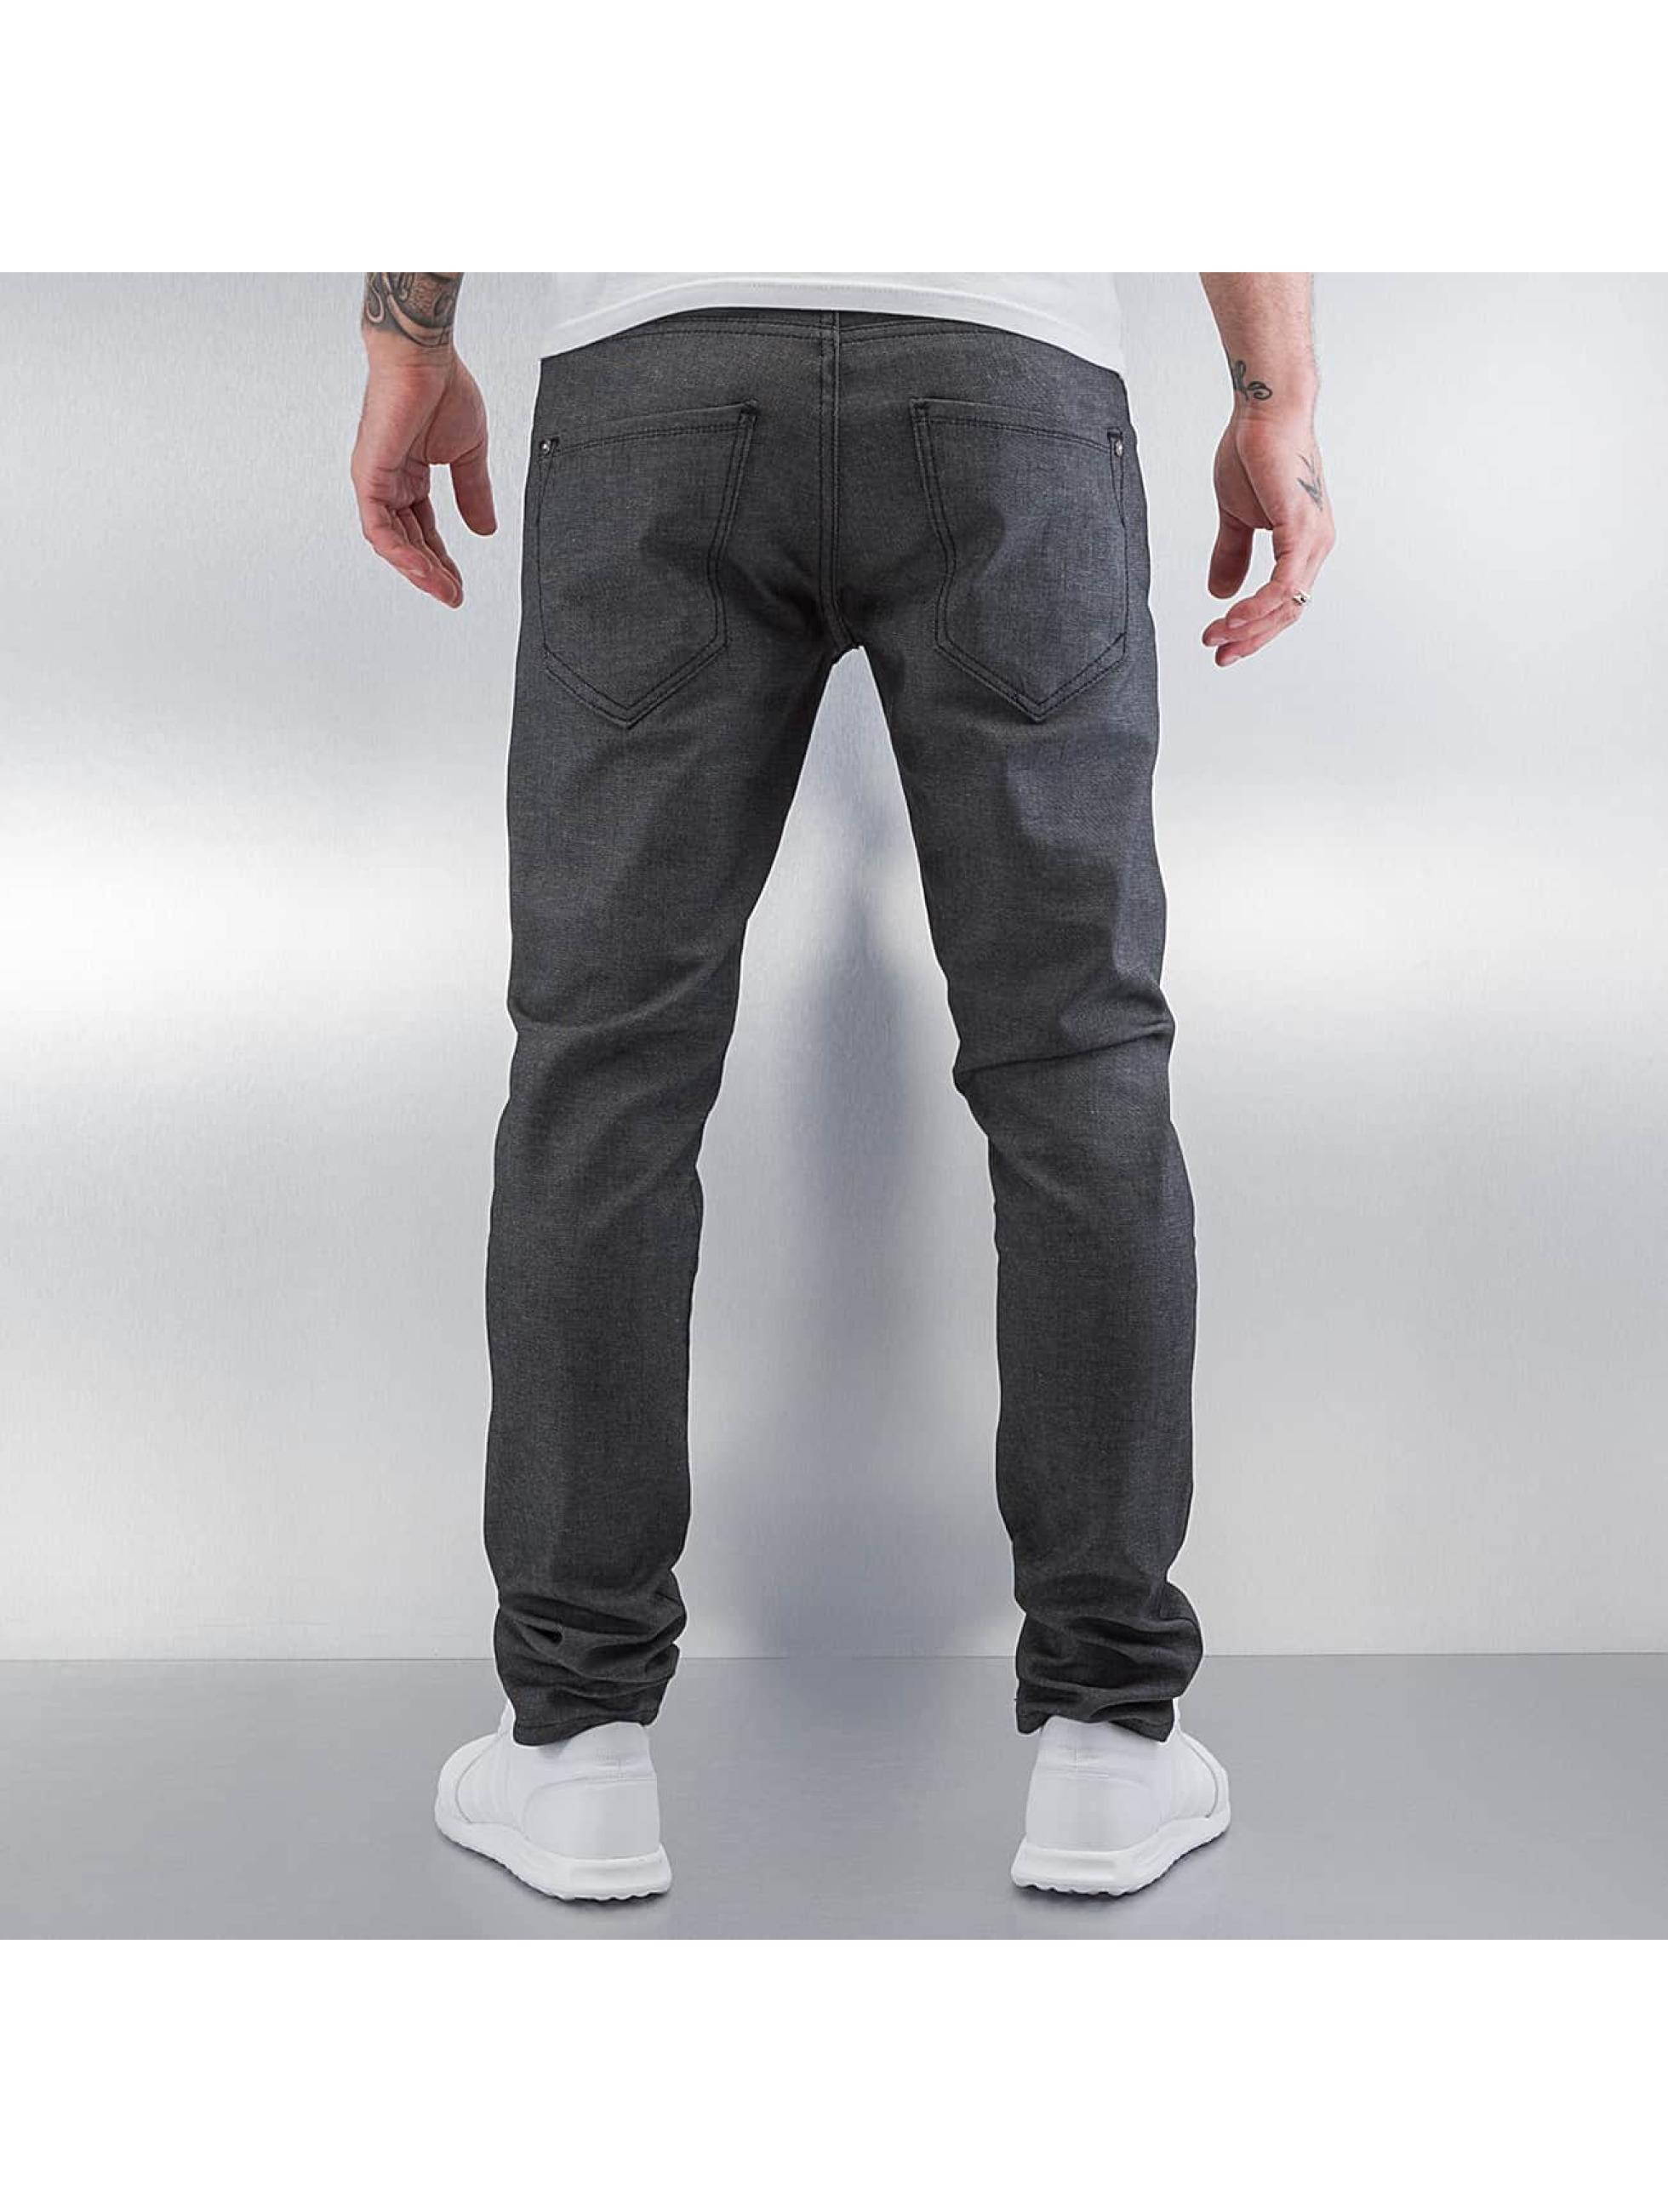 Pascucci Skinny jeans SANTA grijs